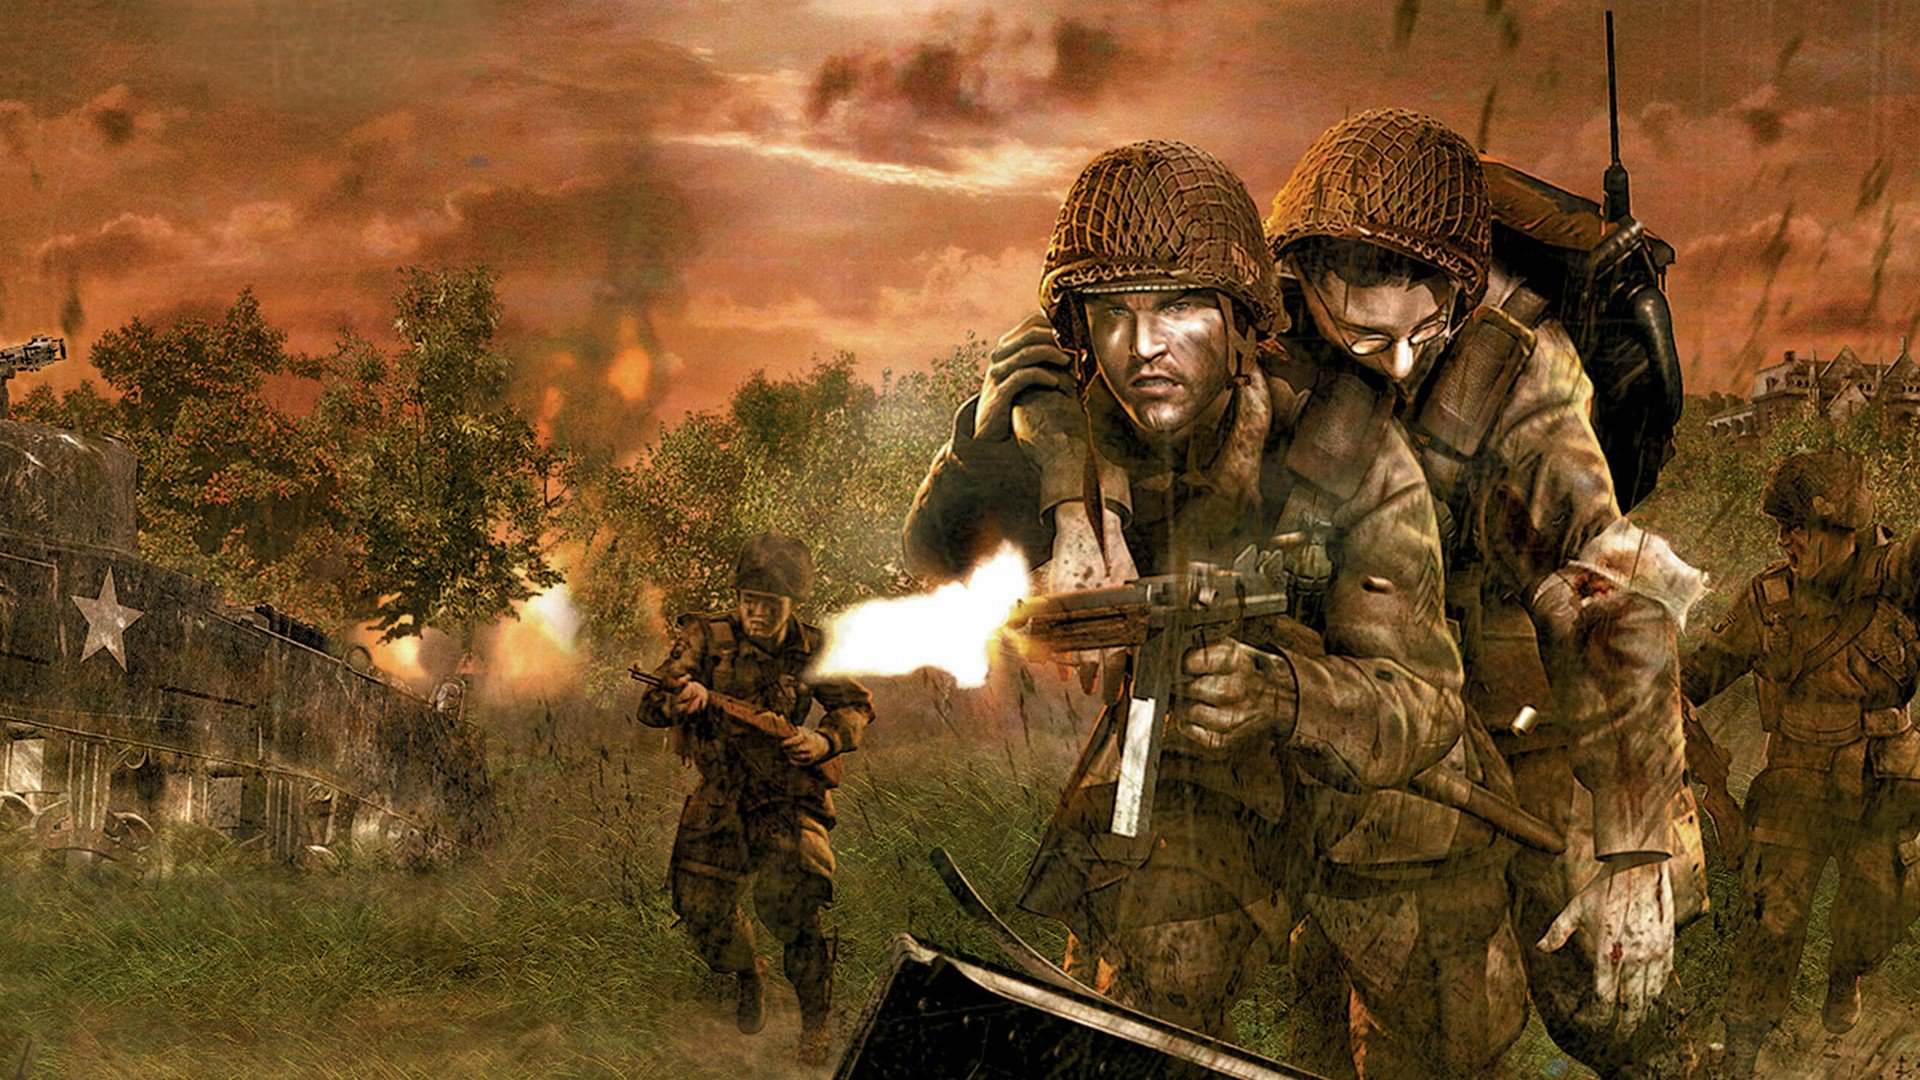 Hell's Highway 'Brutality of War' Trailer